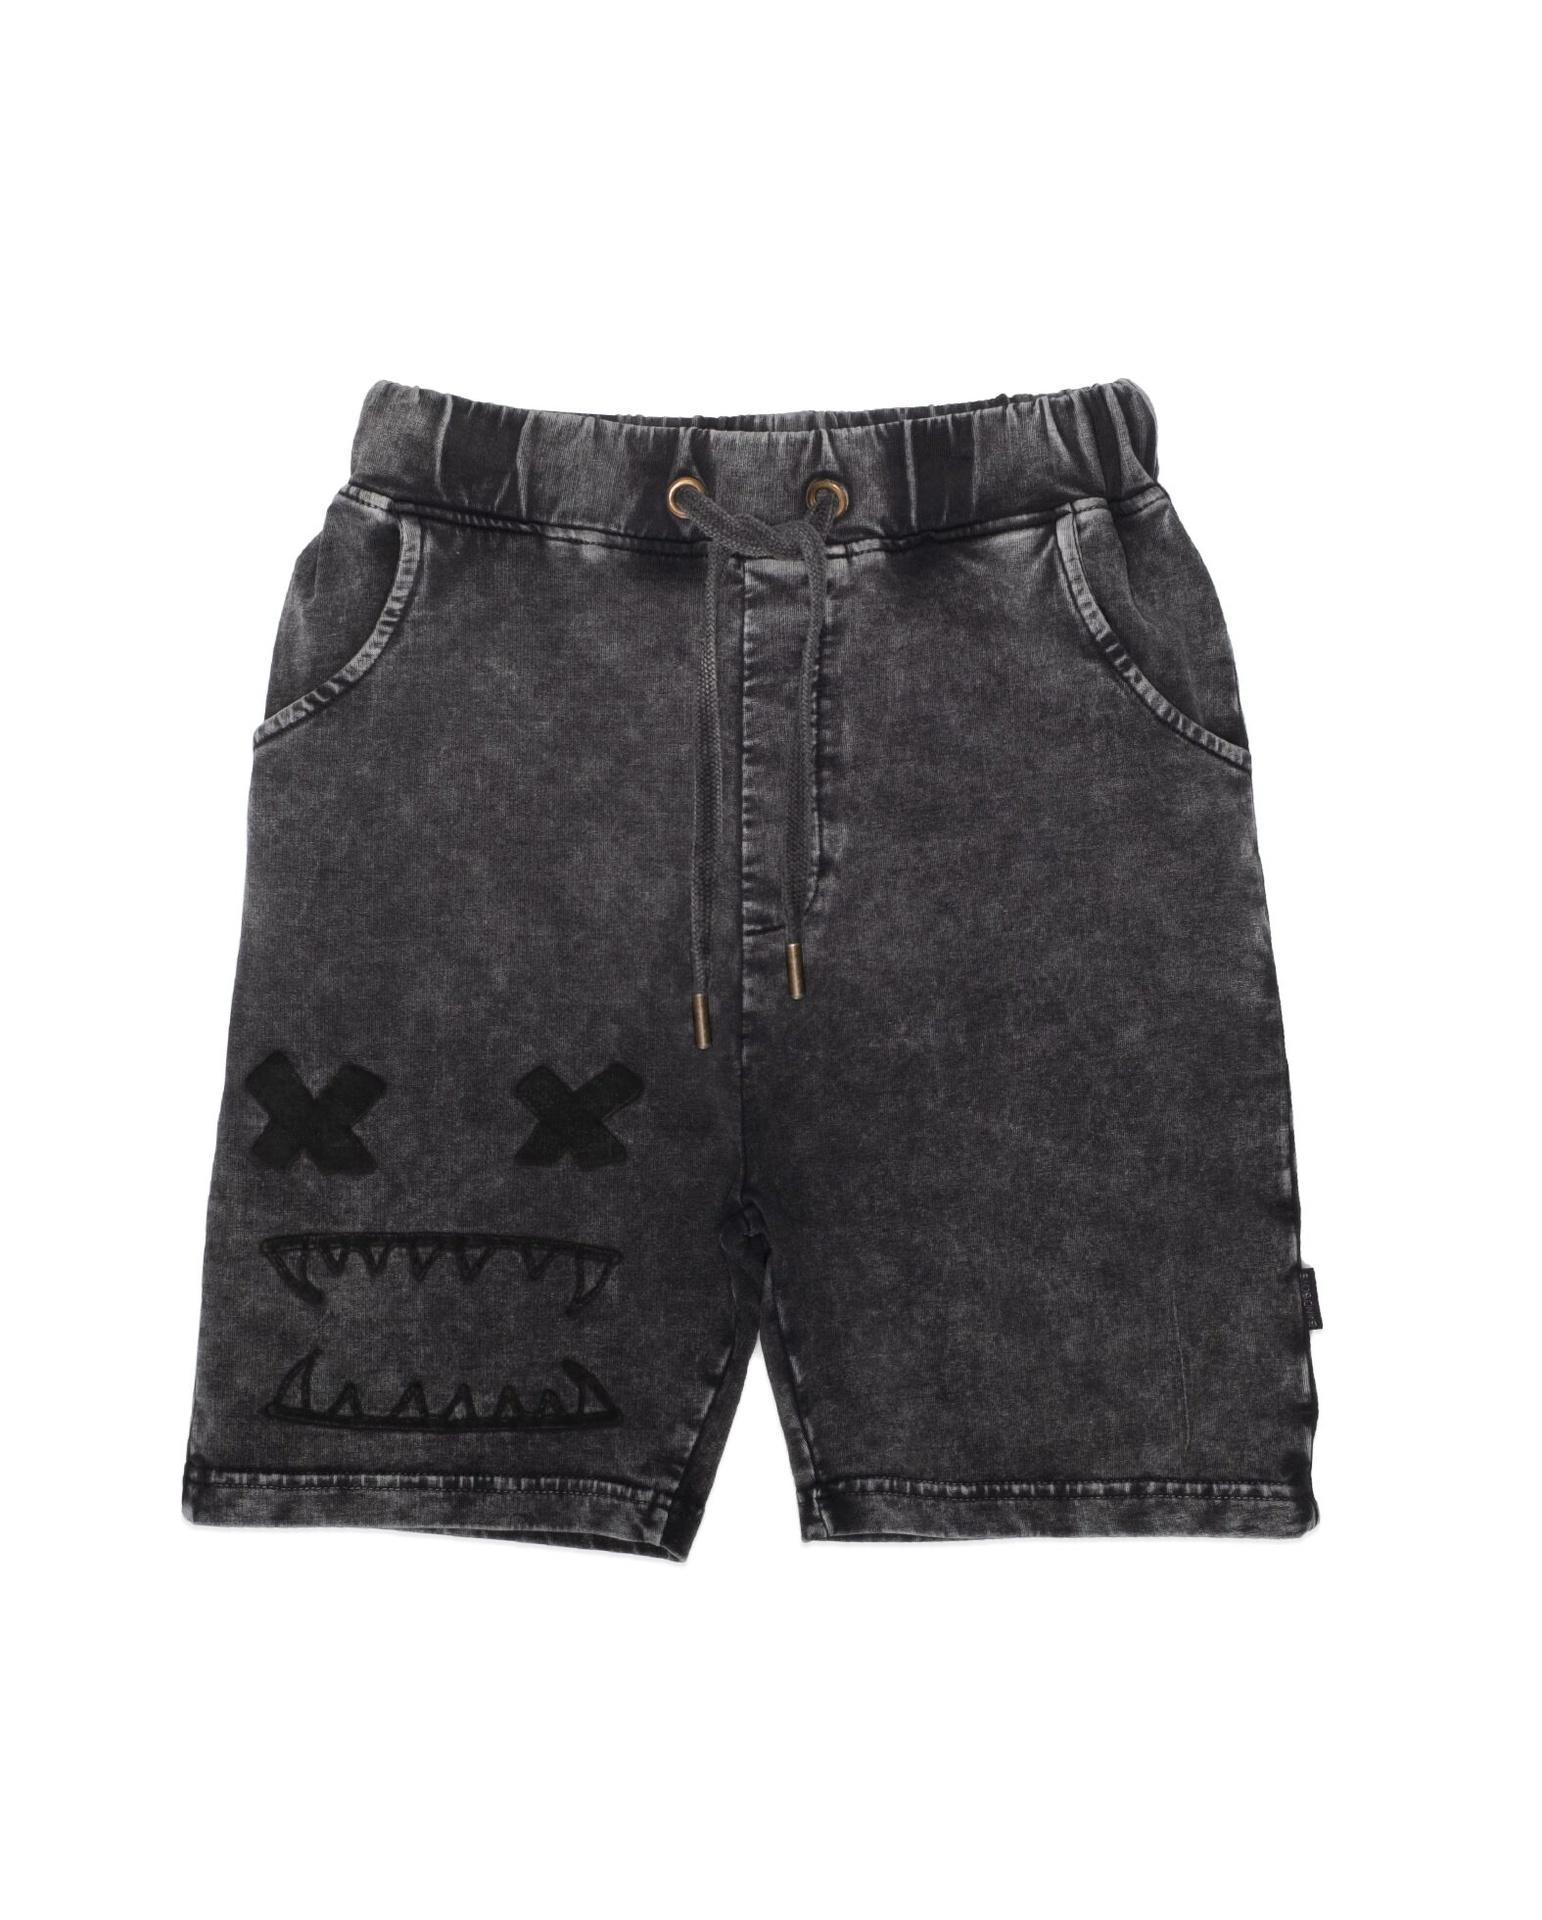 BOB Bandits Cross Eyes Vintage Black Shorts